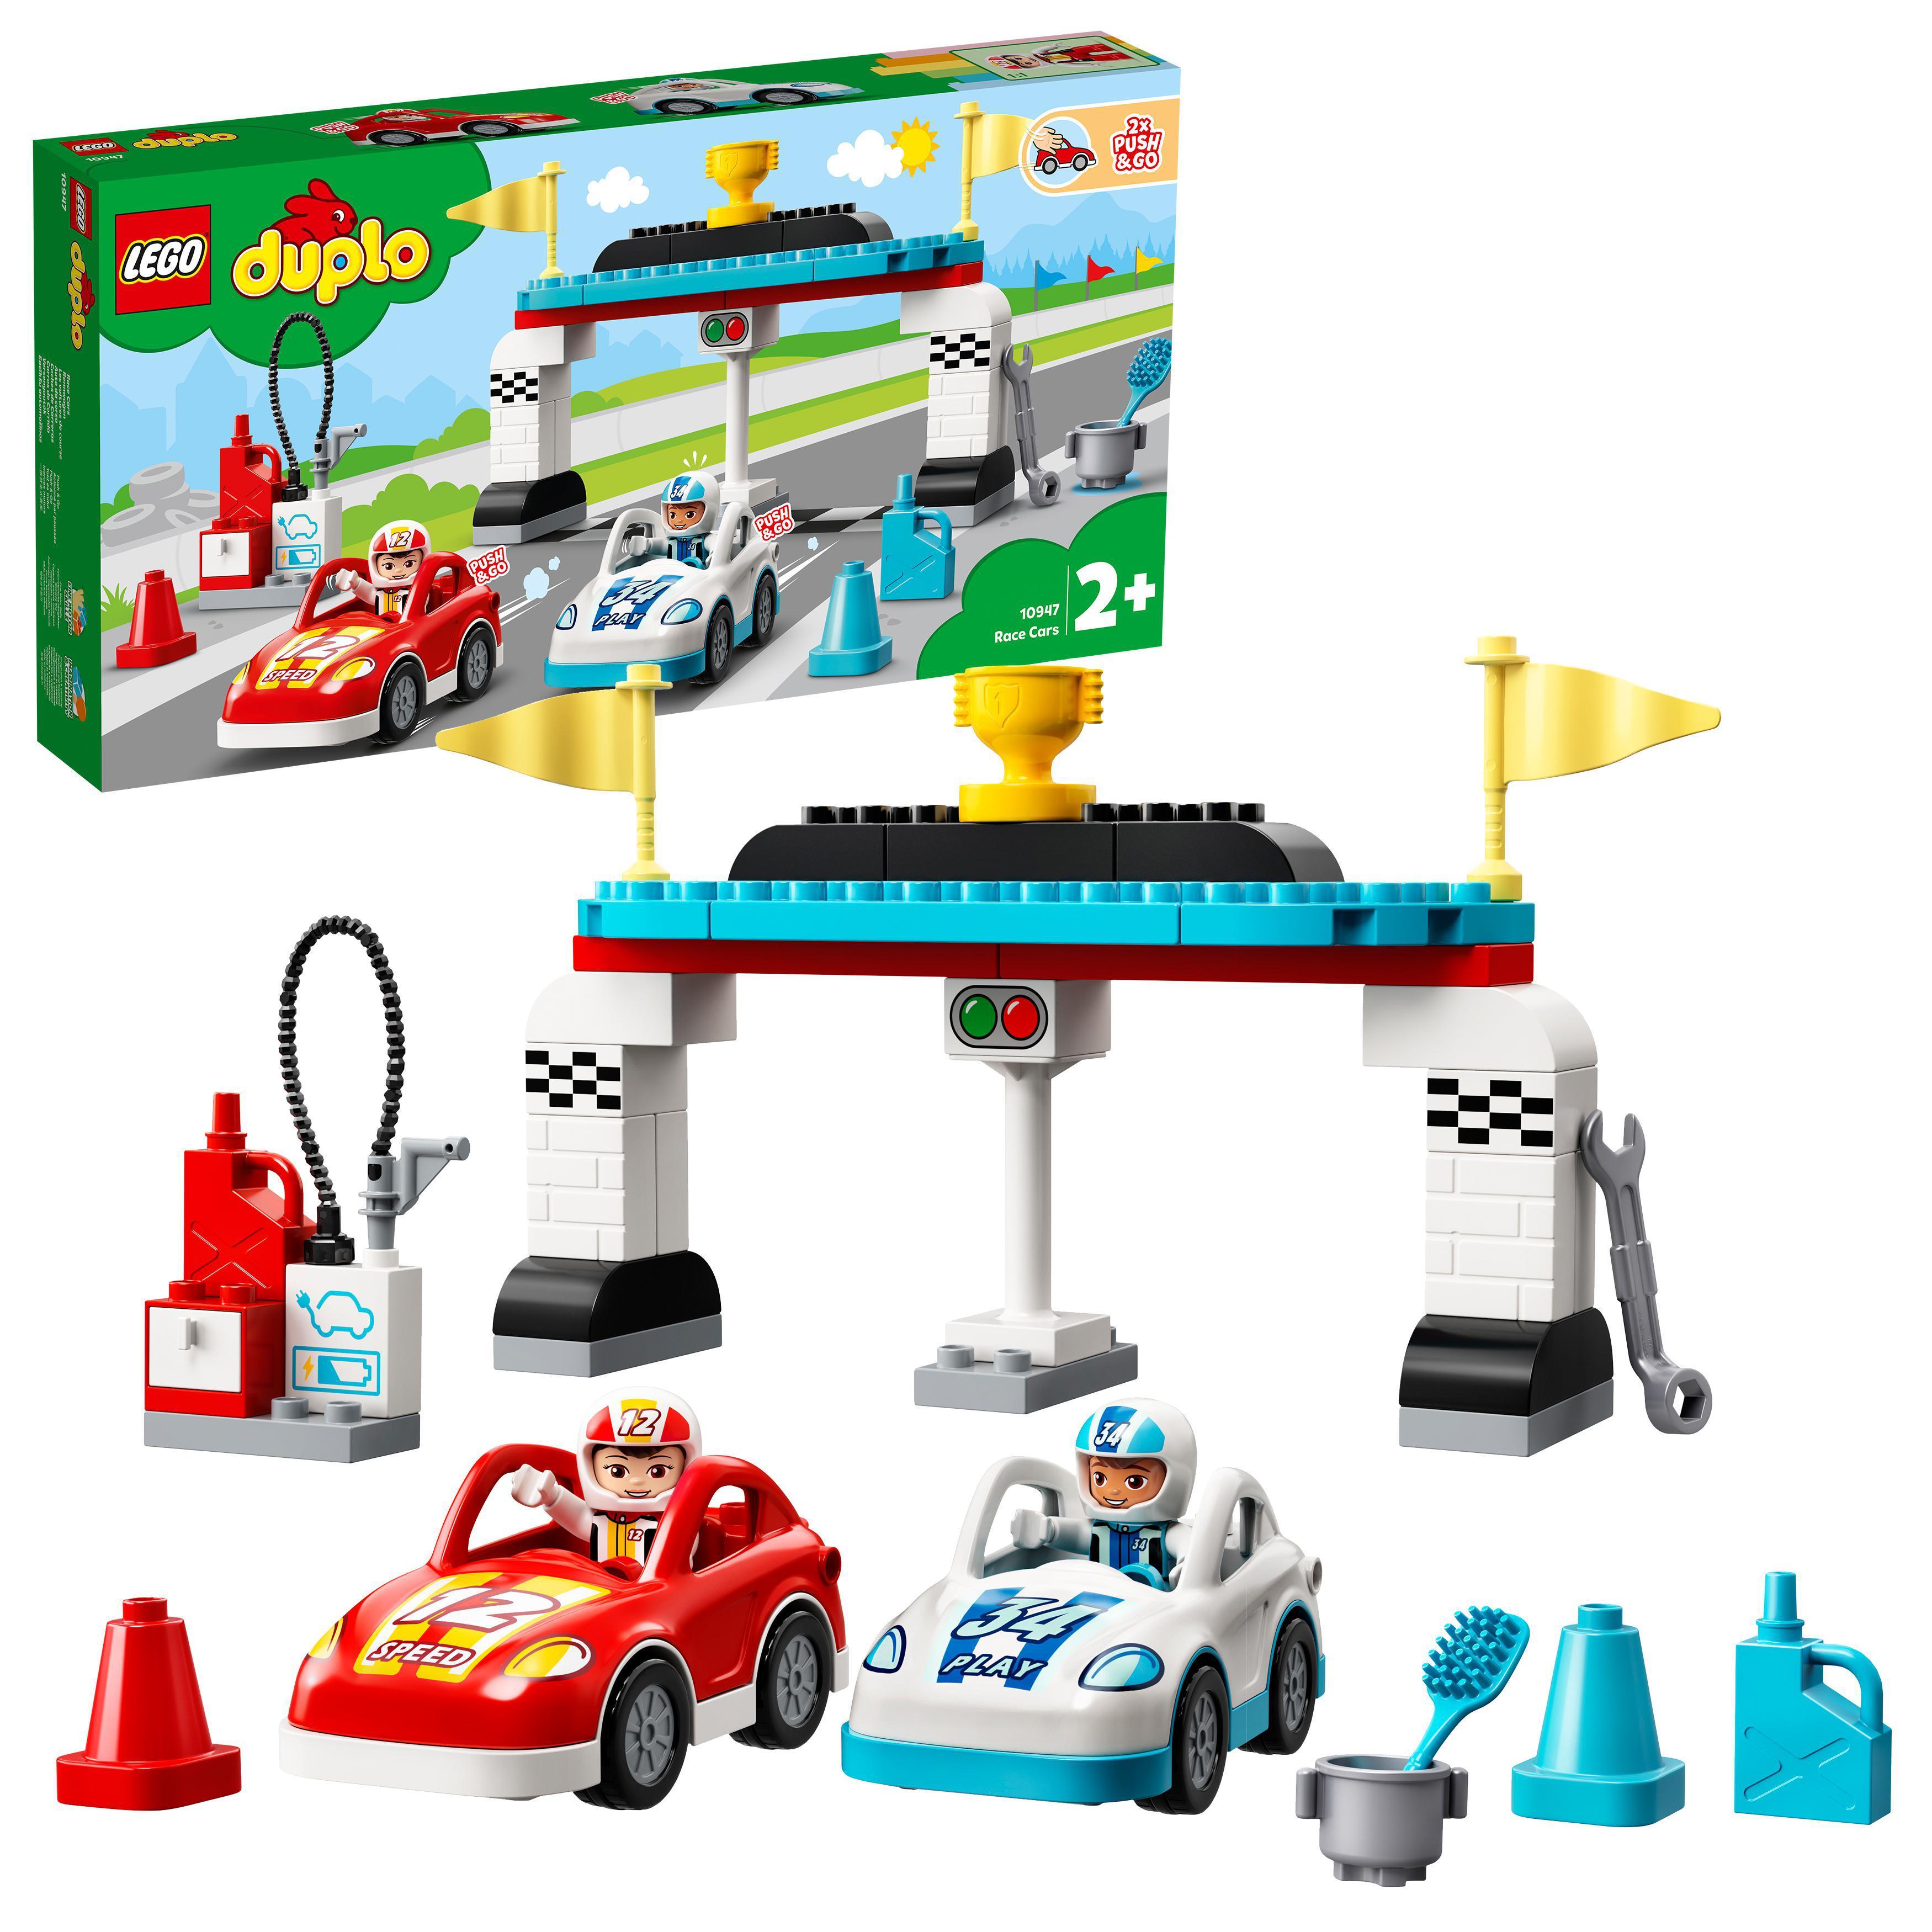 LEGO DUPLO - Race Cars (10947)